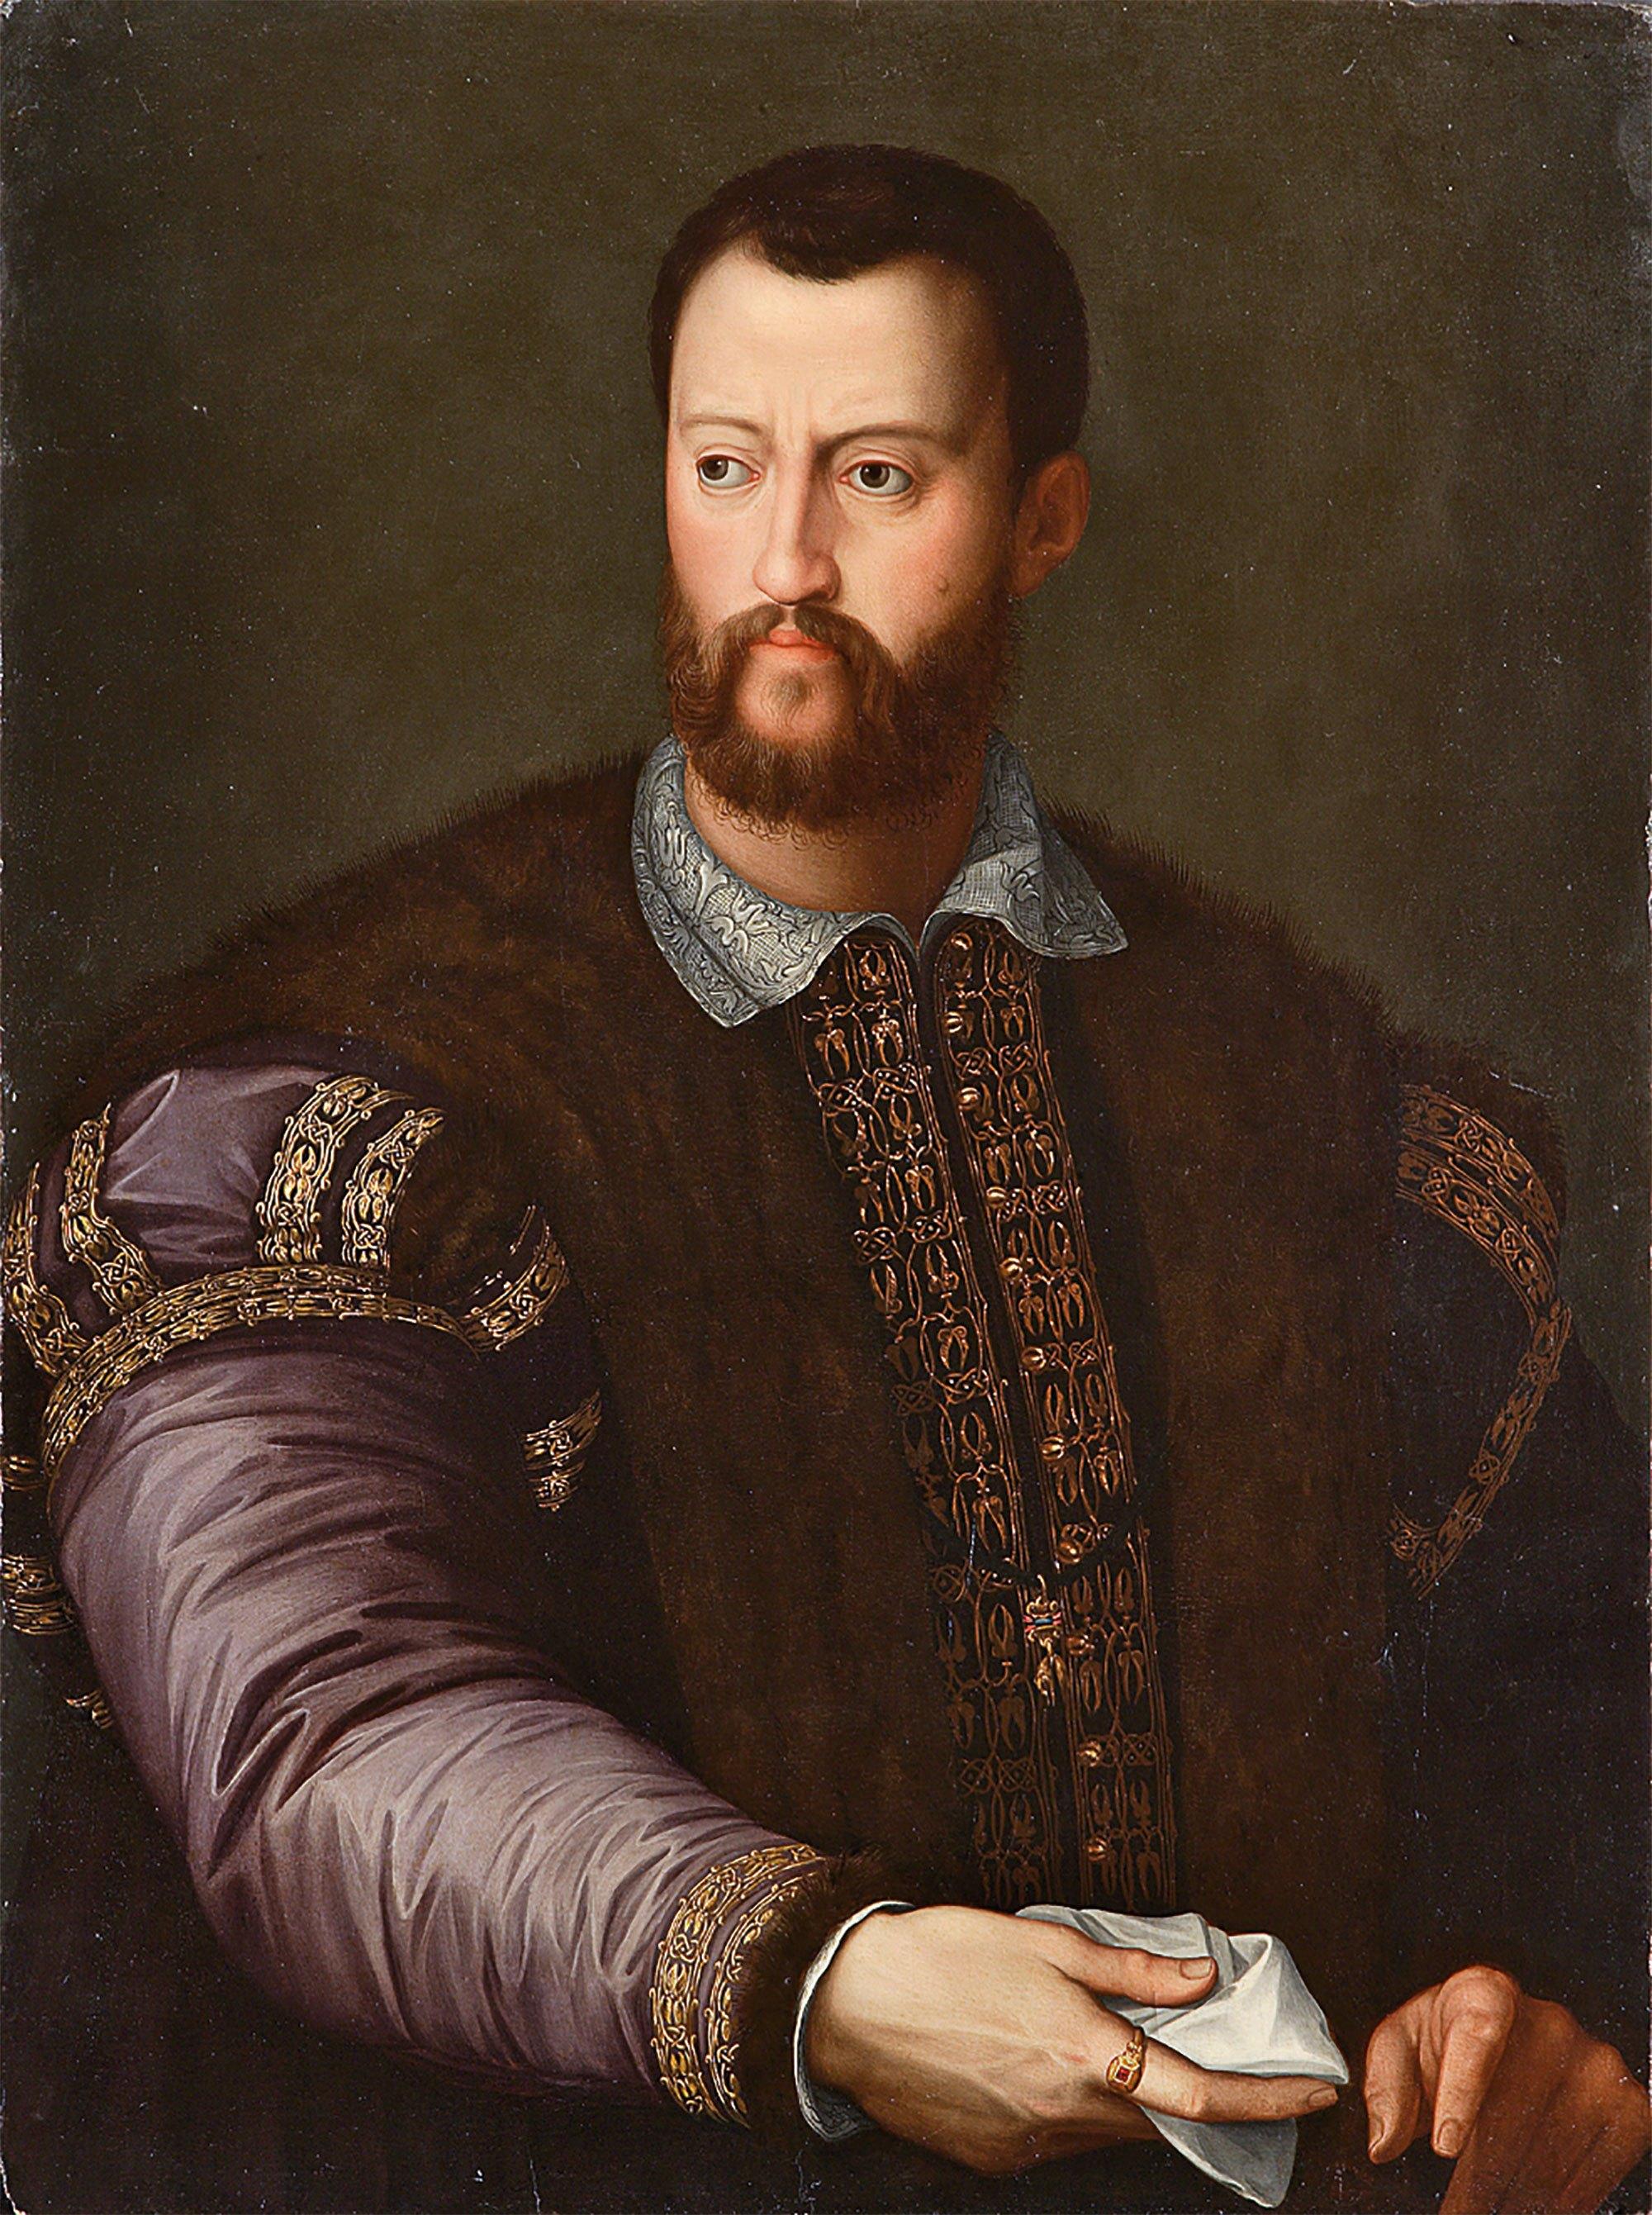 Cosimo I dei medici